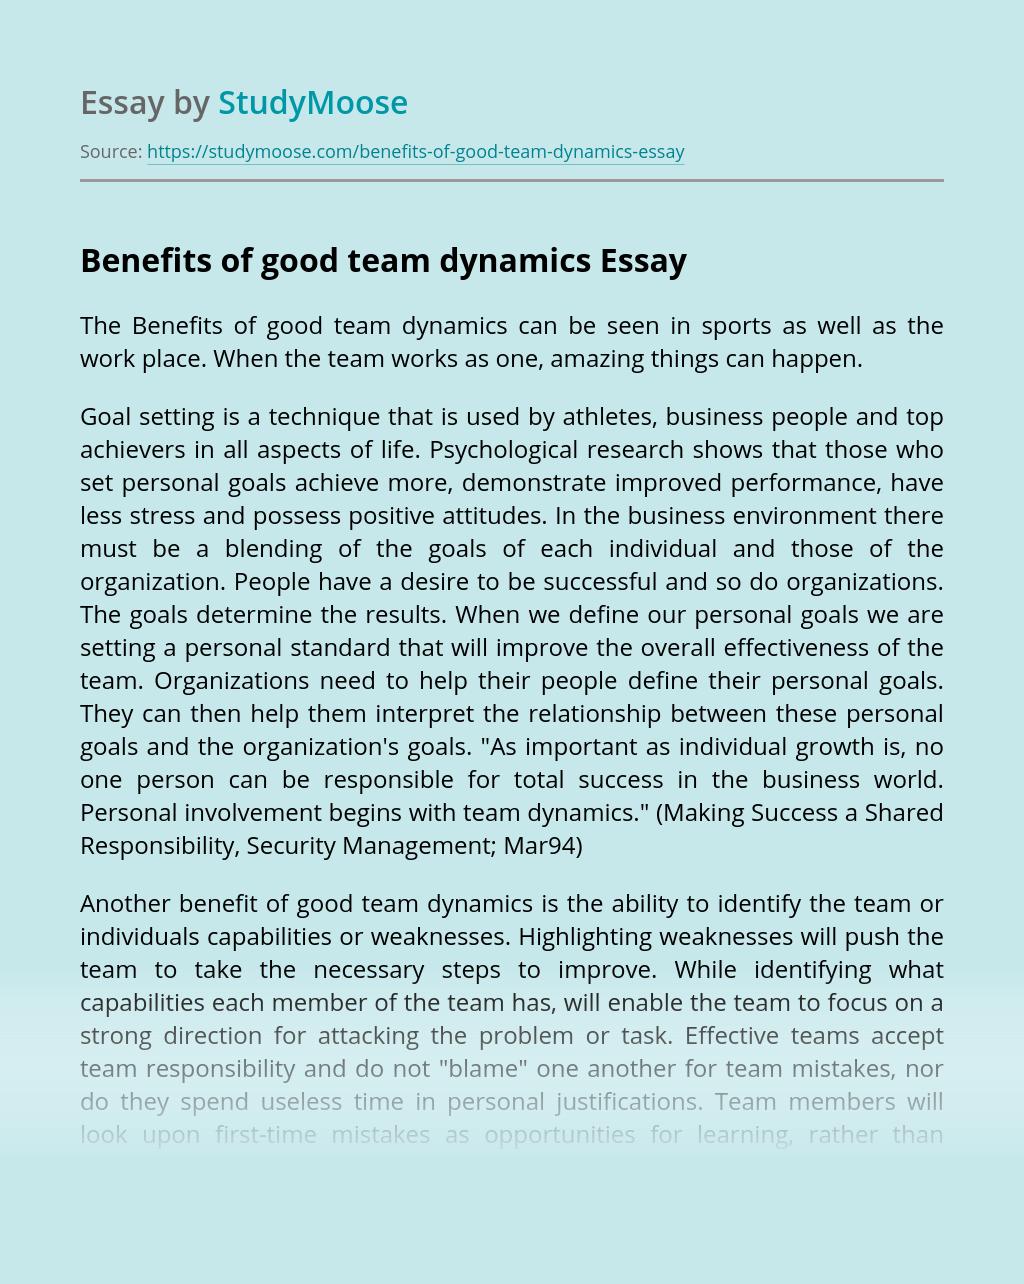 Benefits of good team dynamics